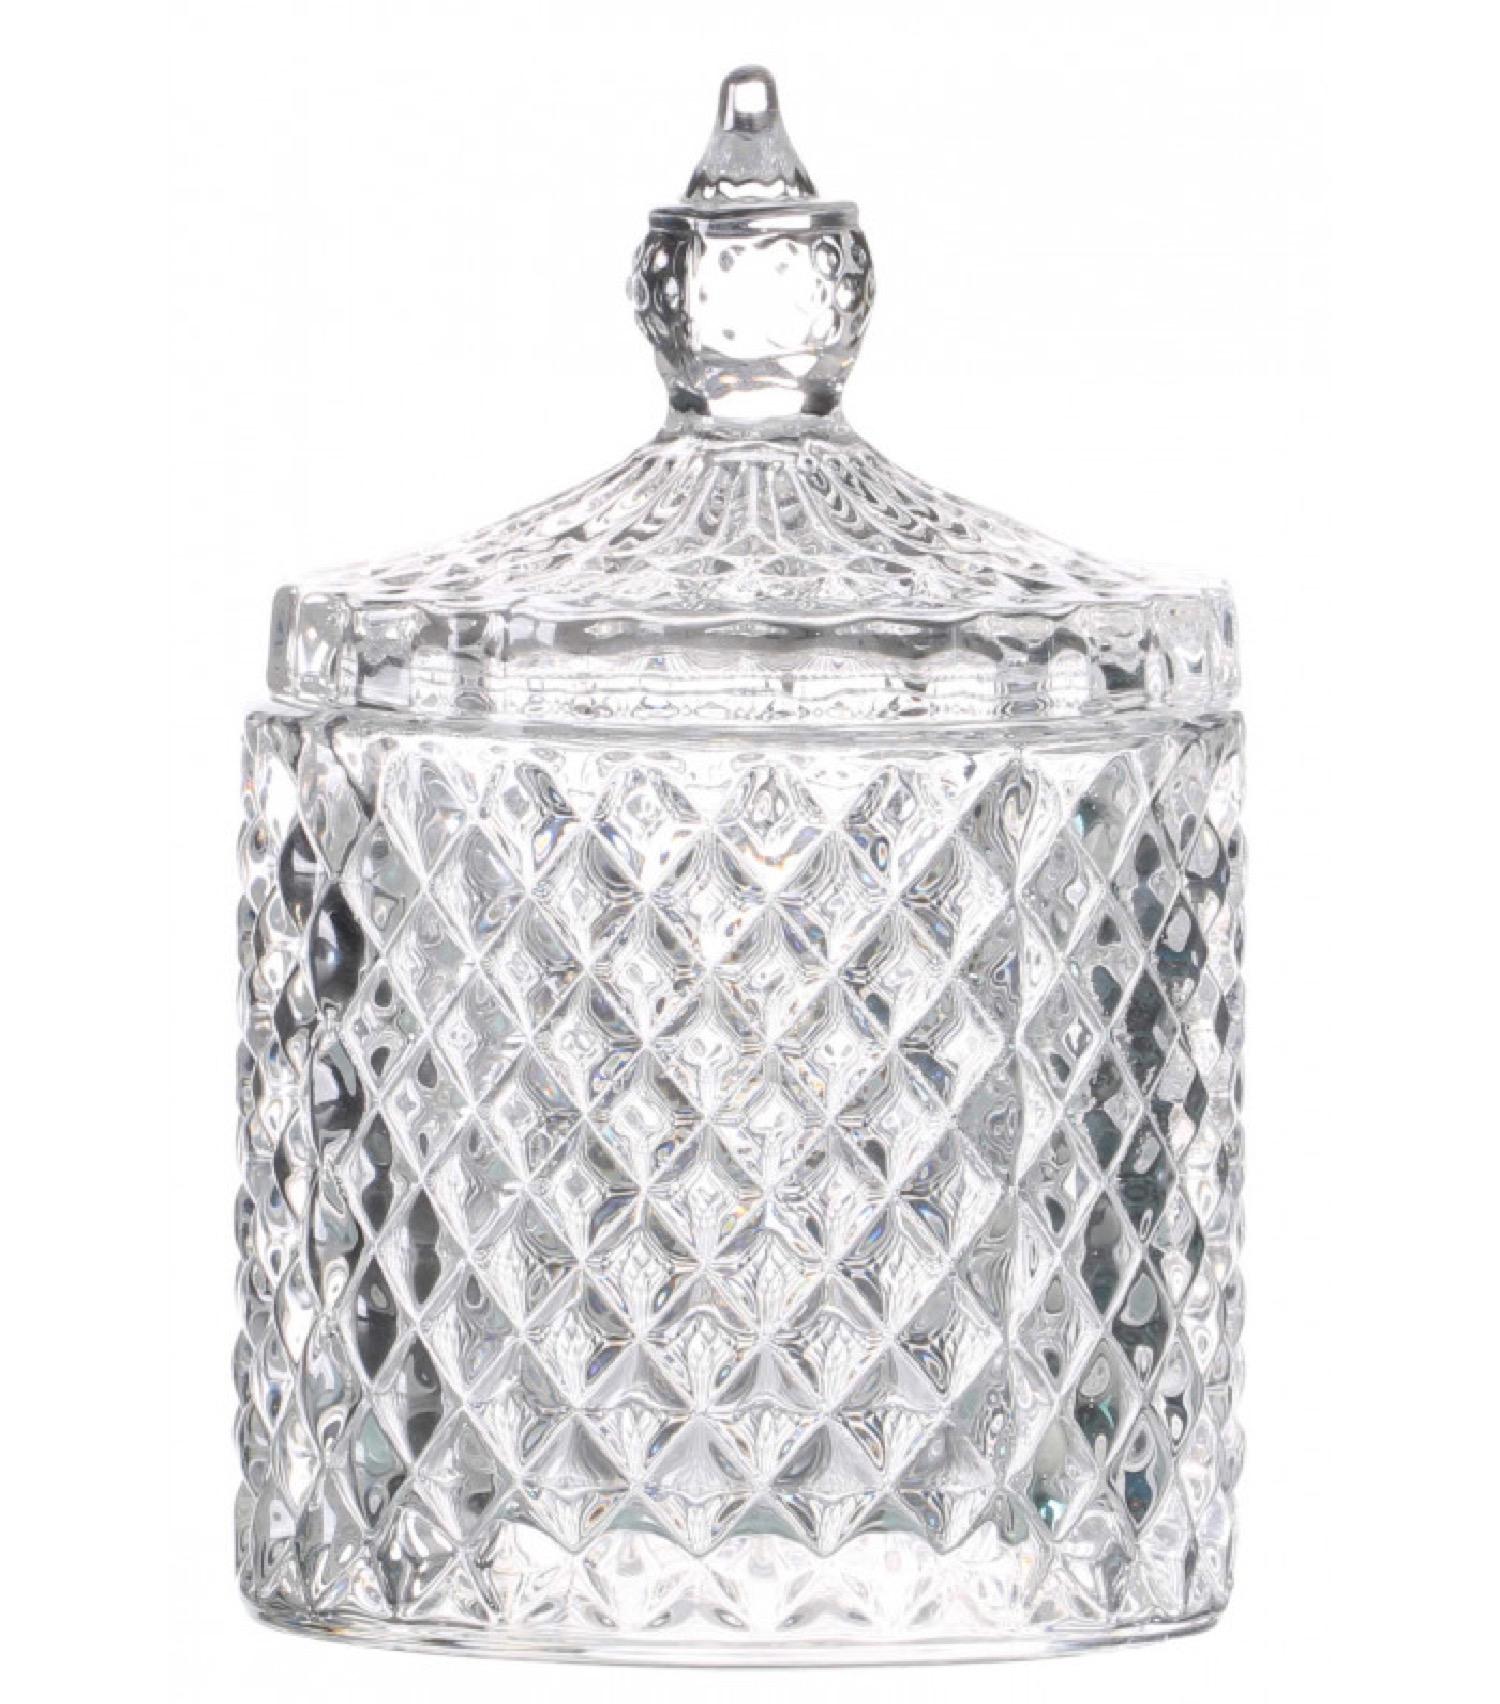 Boîte rangement ronde salle de bain verre 8,5x13cm